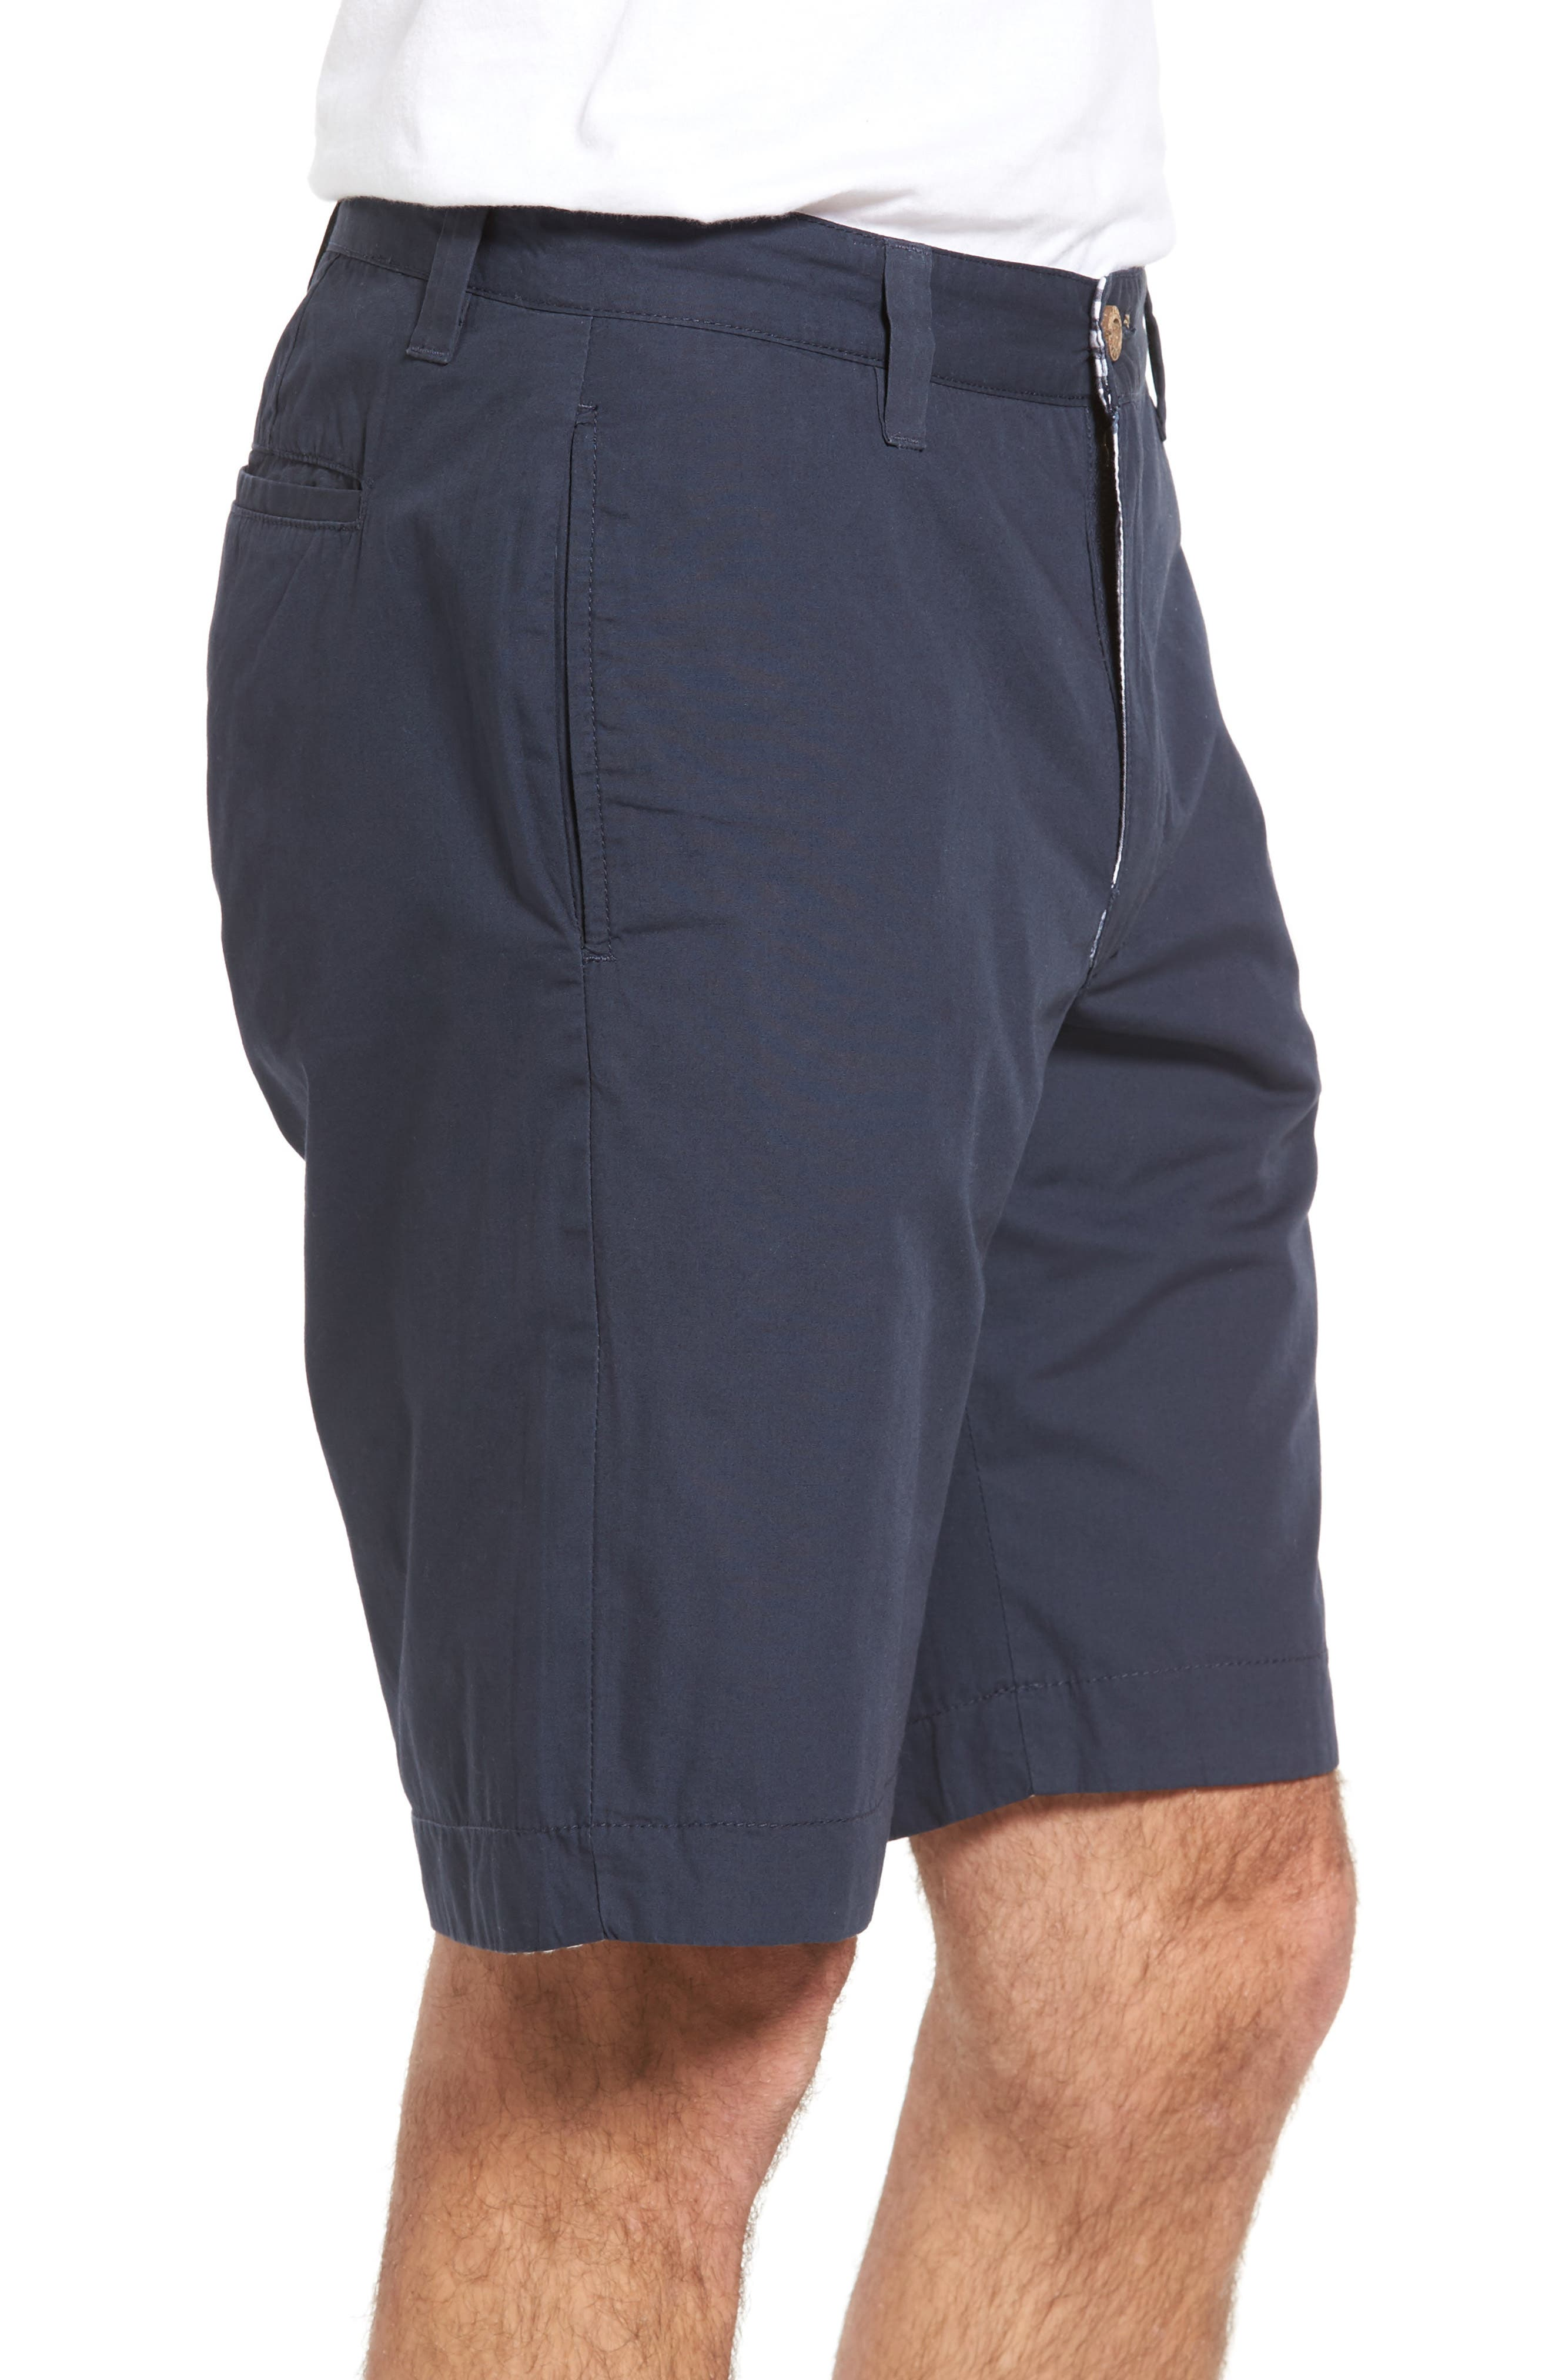 Reversible Walking Shorts,                             Alternate thumbnail 3, color,                             Navy/ Seersucker/ Navy